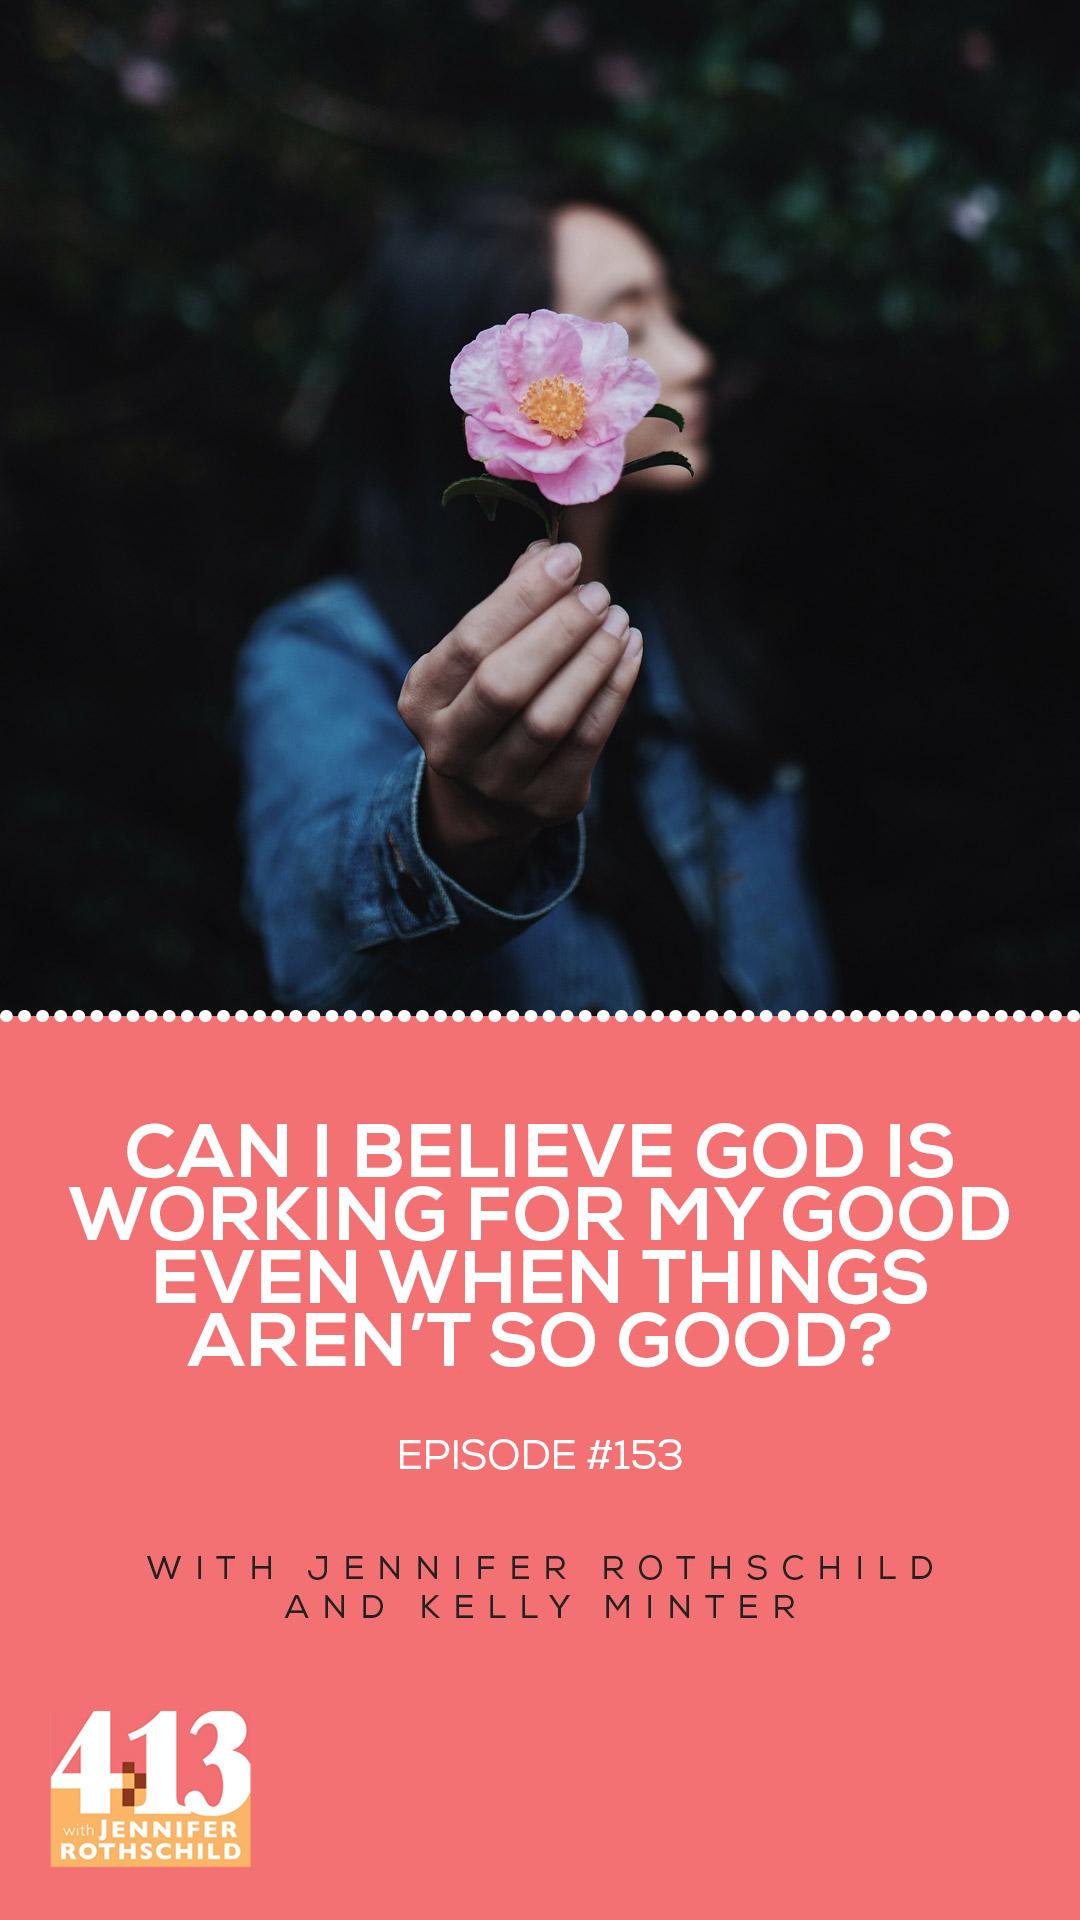 Believe God Good Things Aren't Good